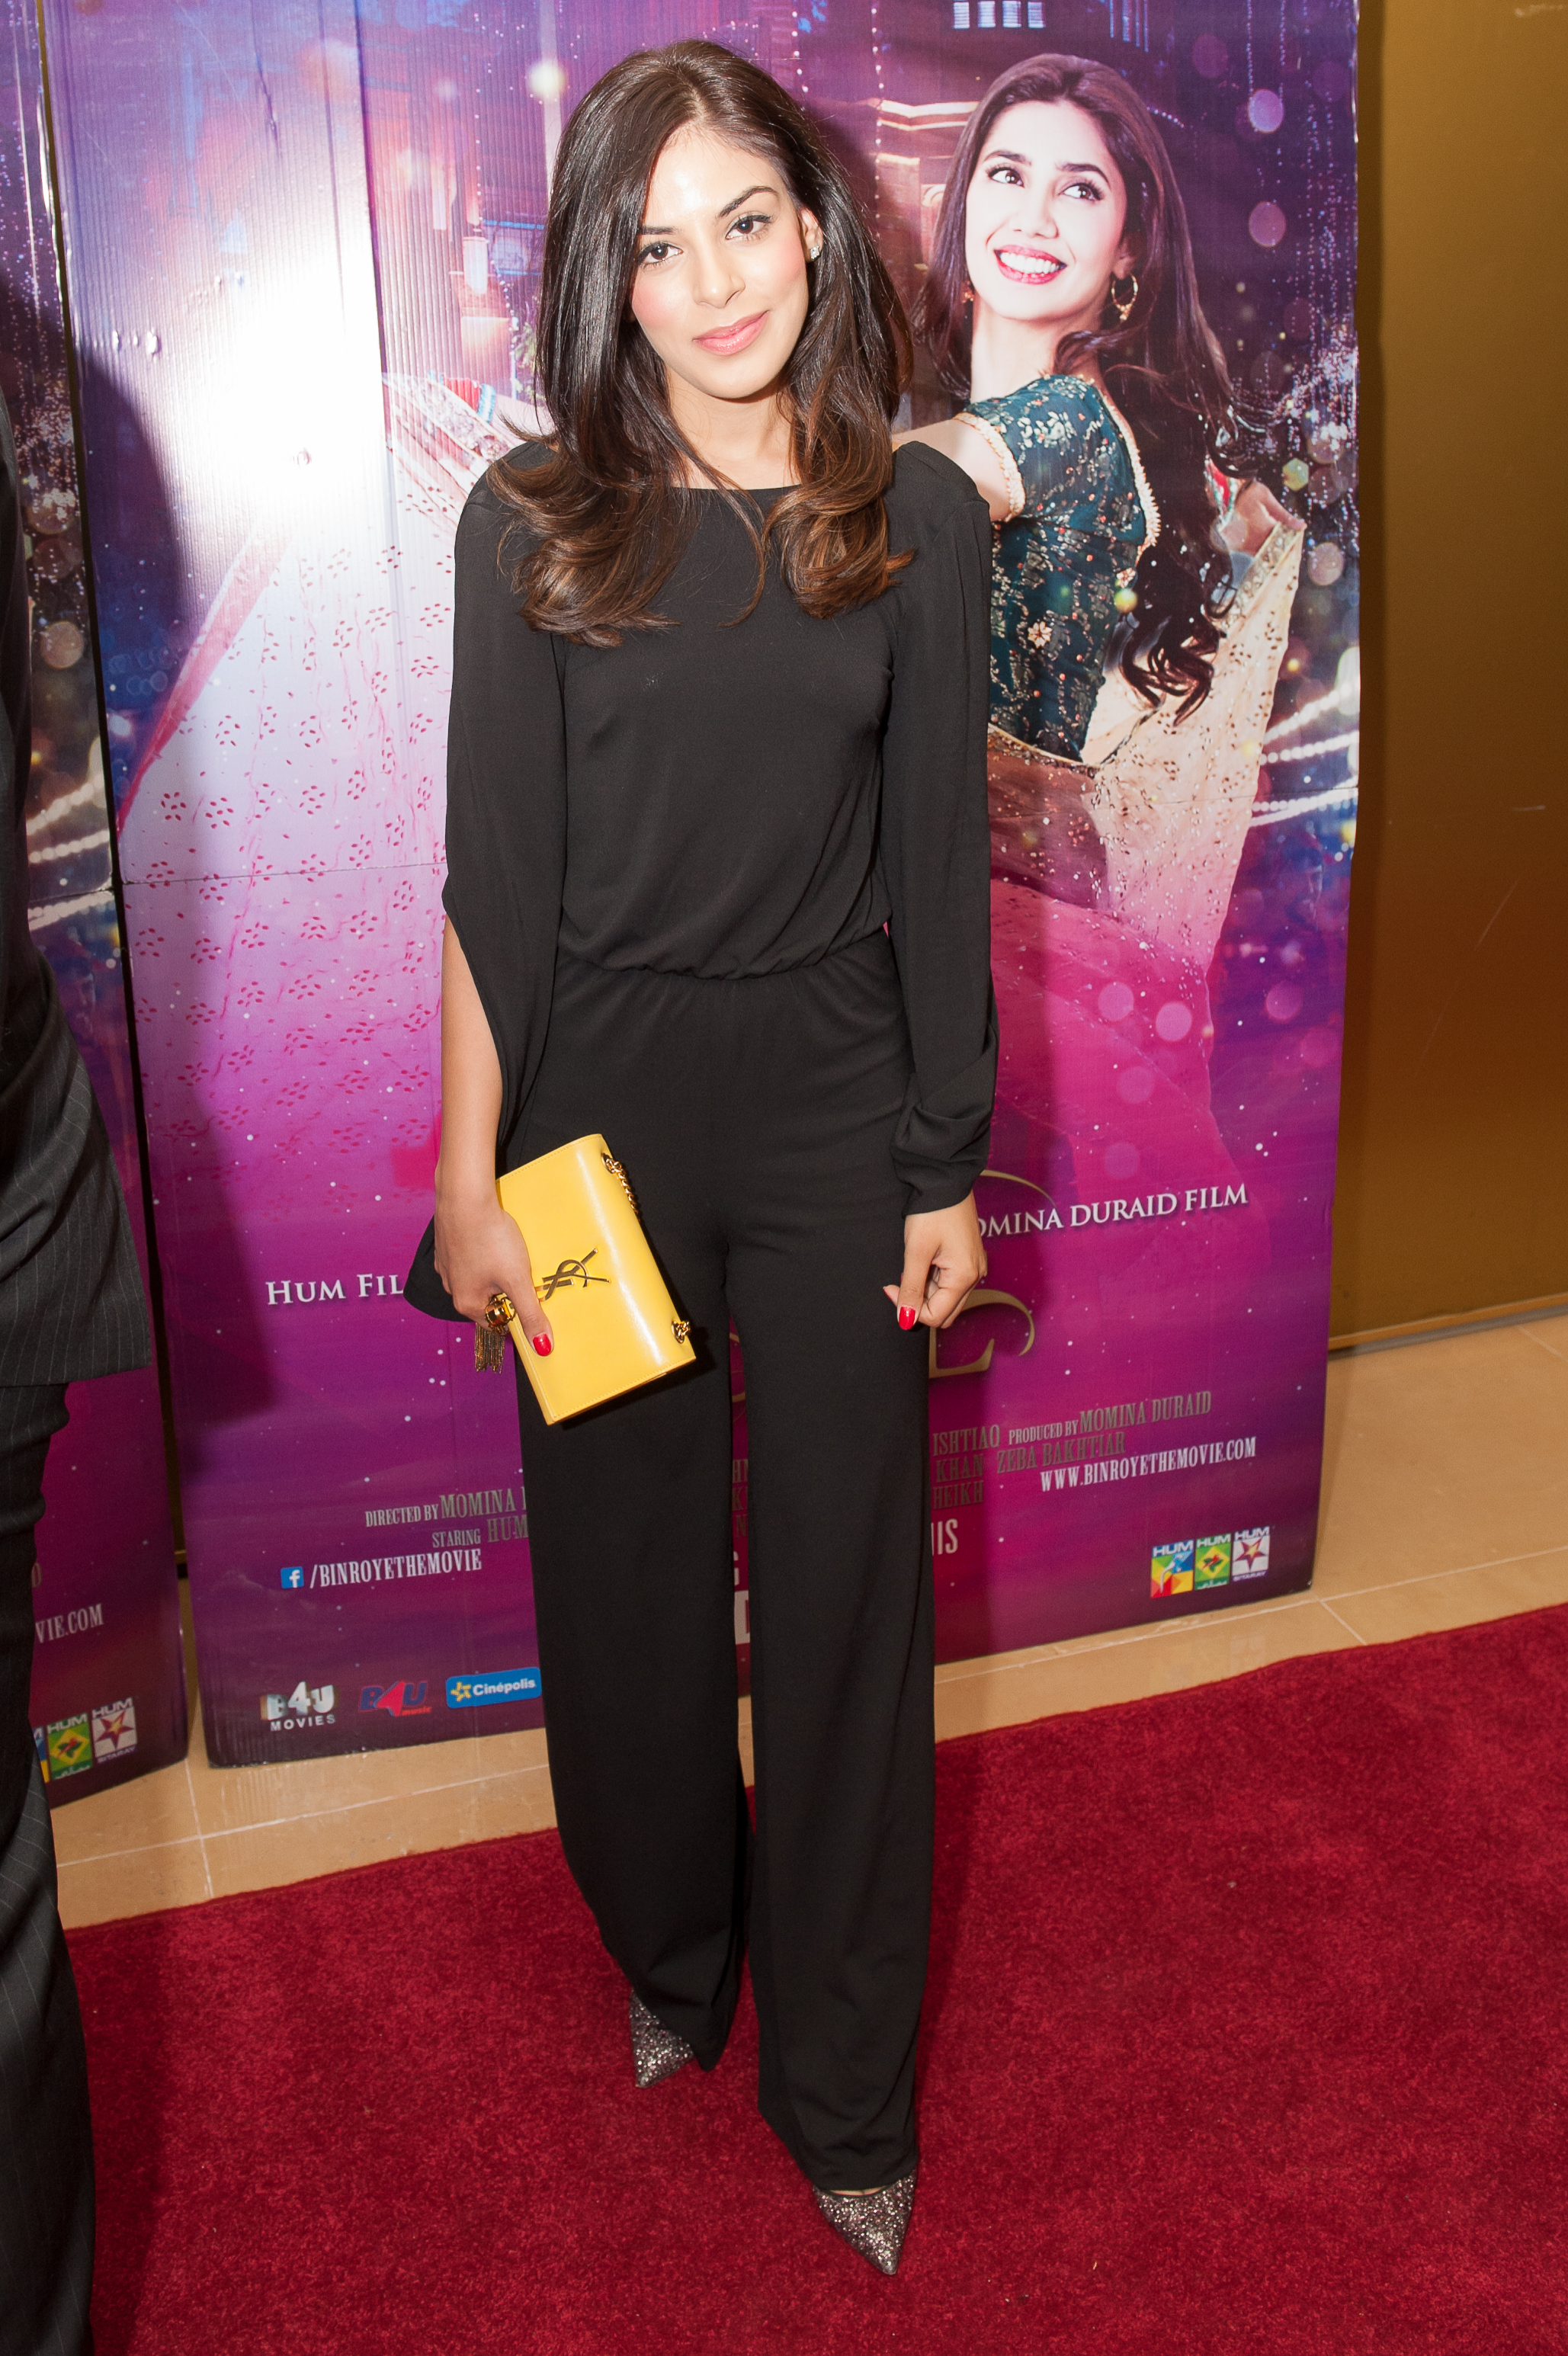 Bin Roye Desi Rascals cast - Yasmin Karimi at Bin Roy premiere